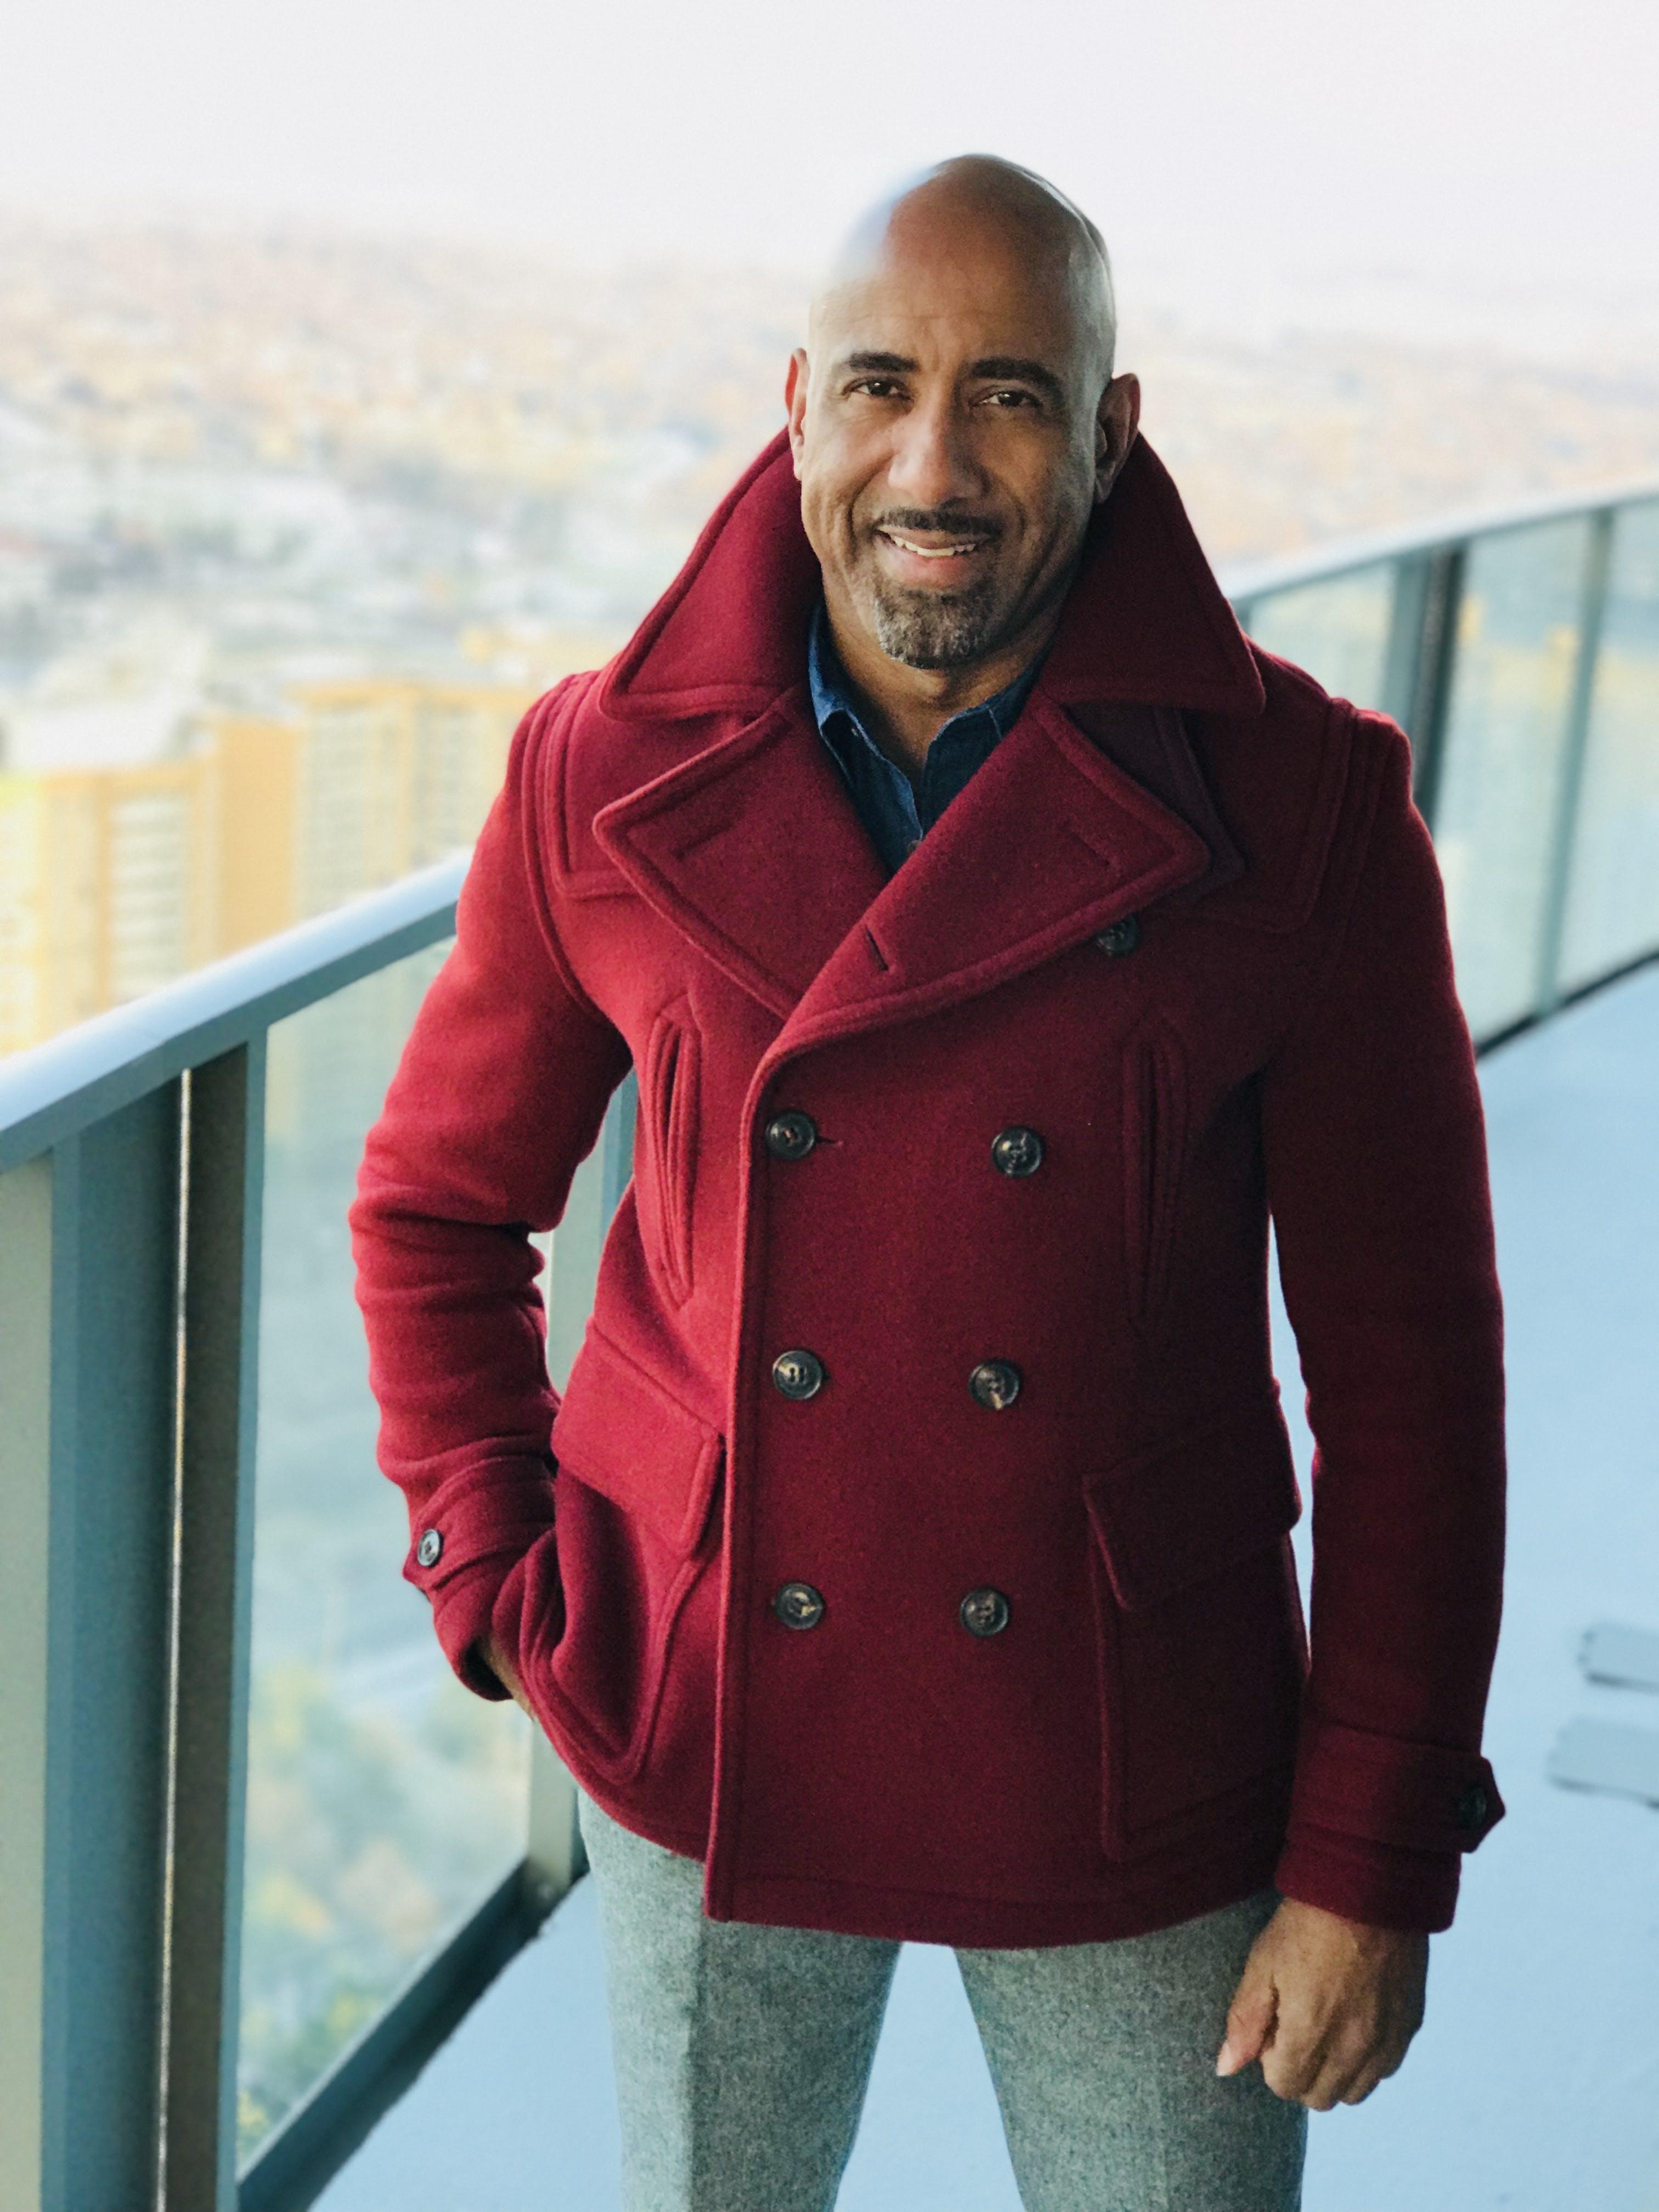 Man in Red Coat